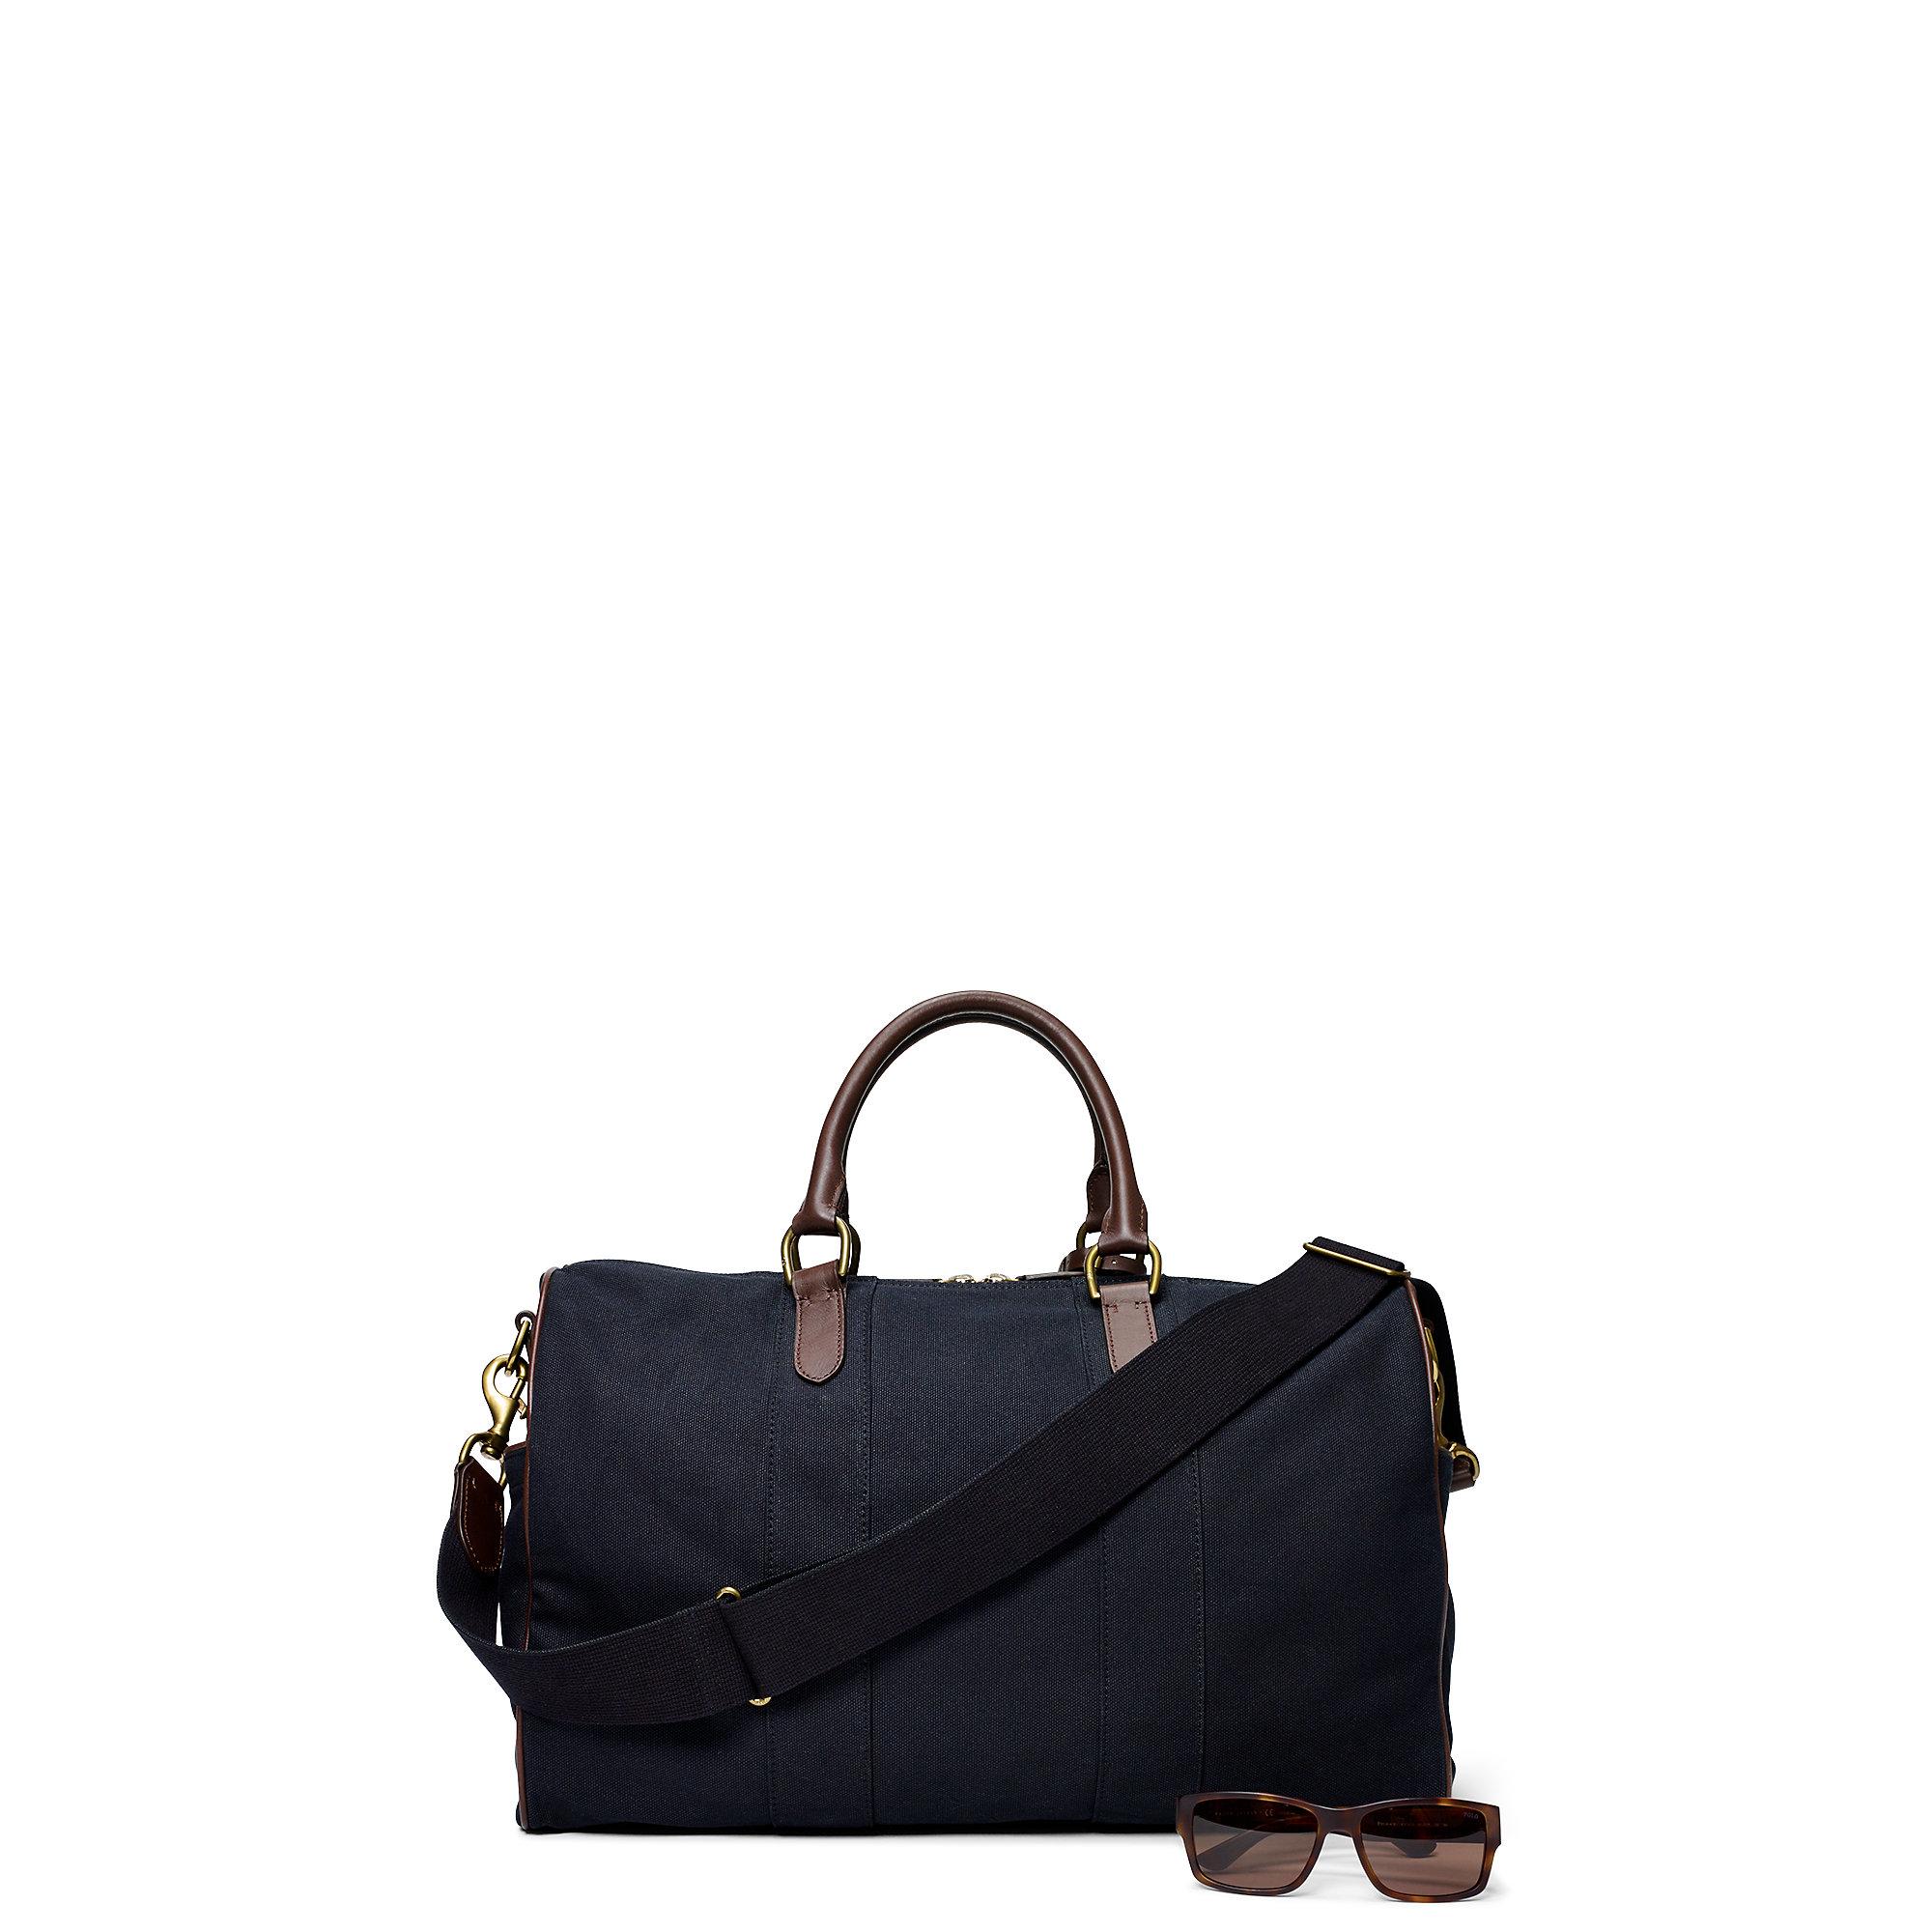 Lyst - Ralph Lauren Canvas Duffel Bag in Black for Men 3a8d8a0c4df8f